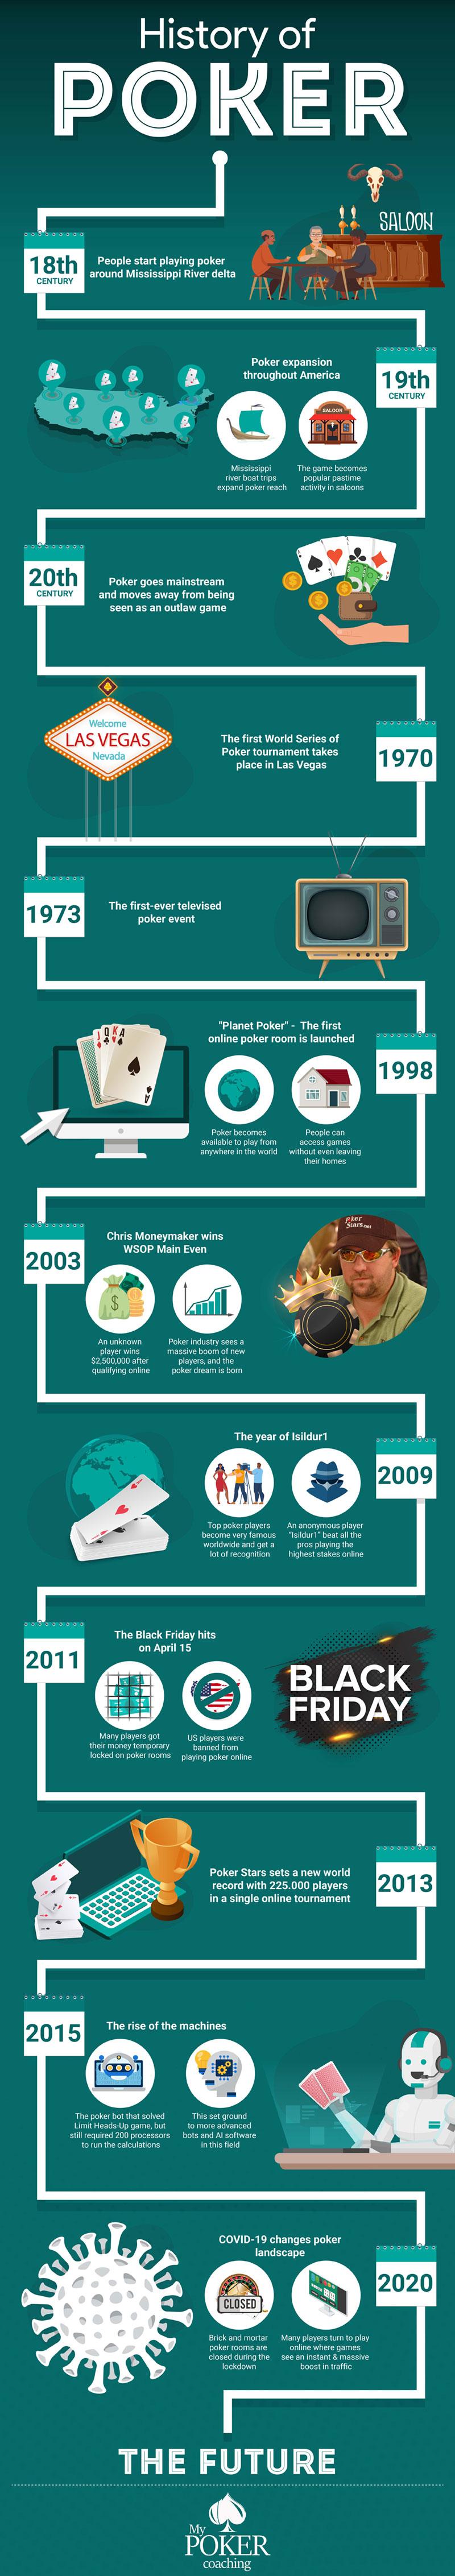 history-of-poker